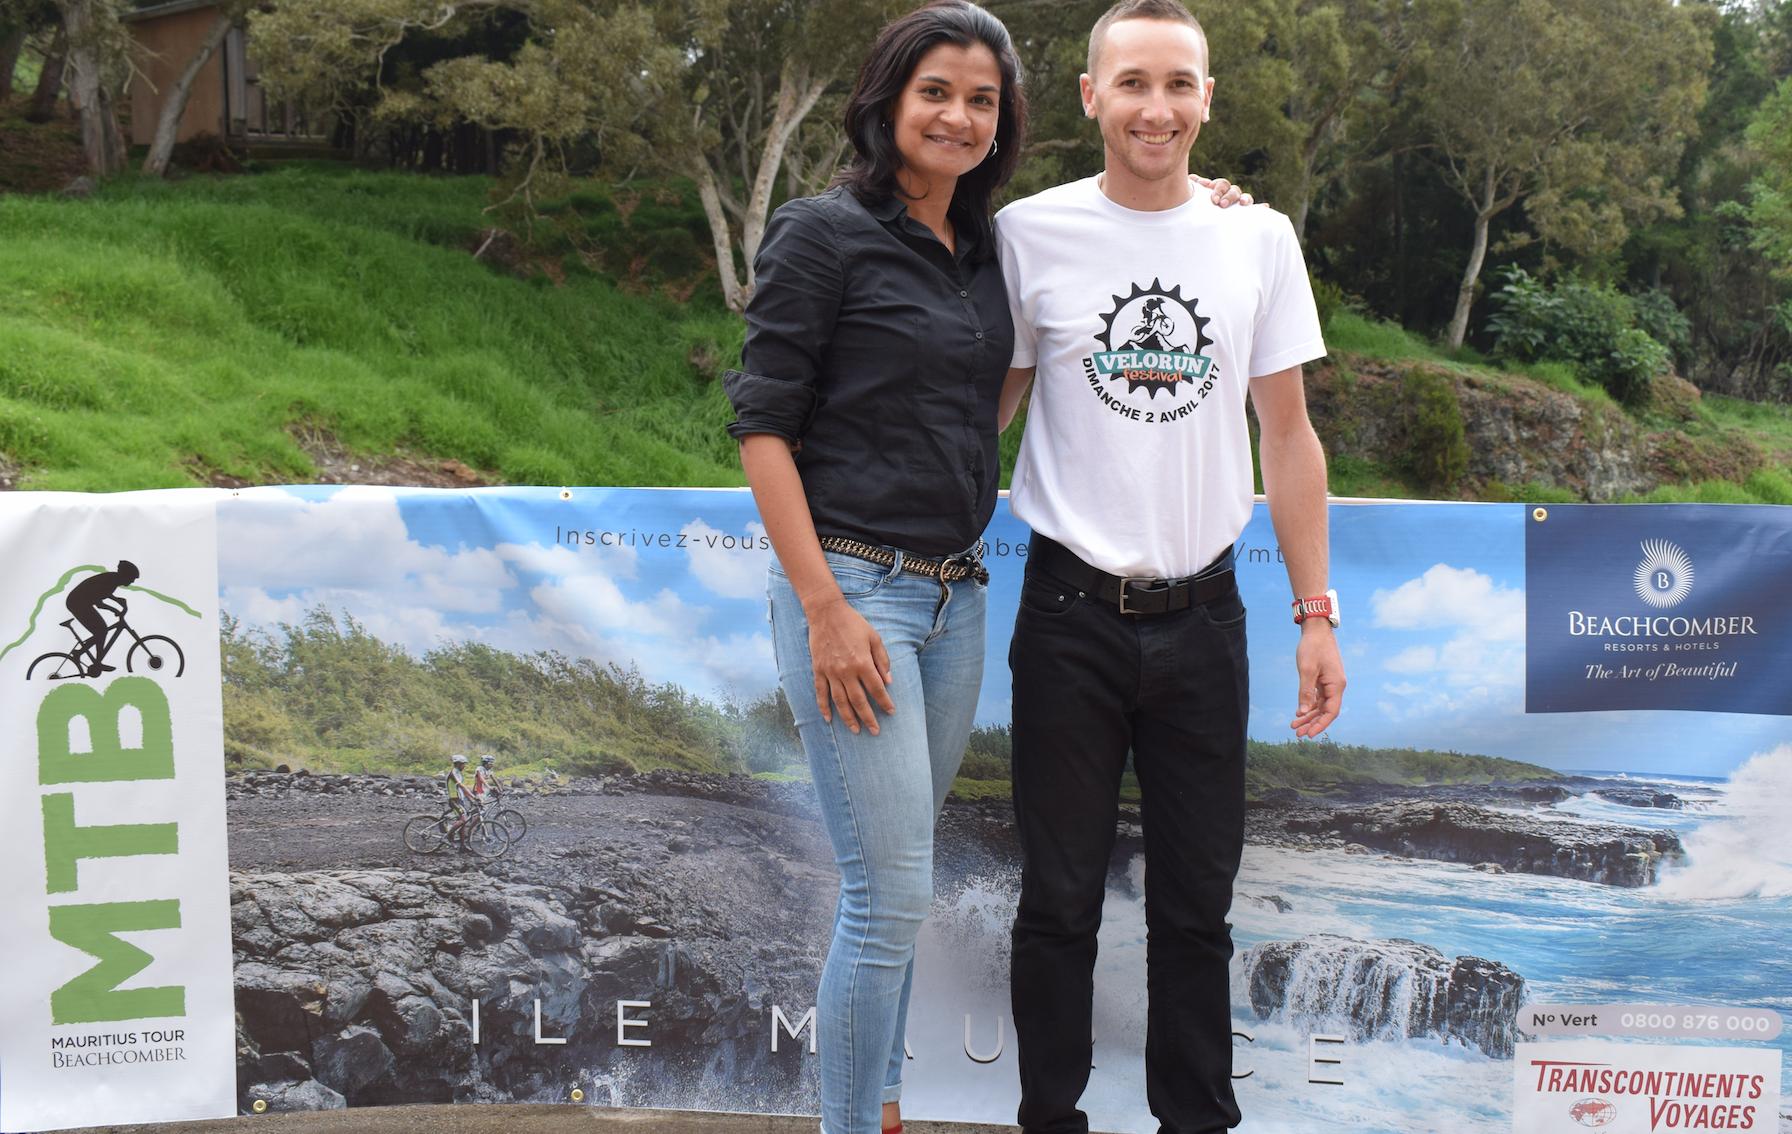 Avec Arianne Bellepeau, la représentante de Beachcomber Maurice